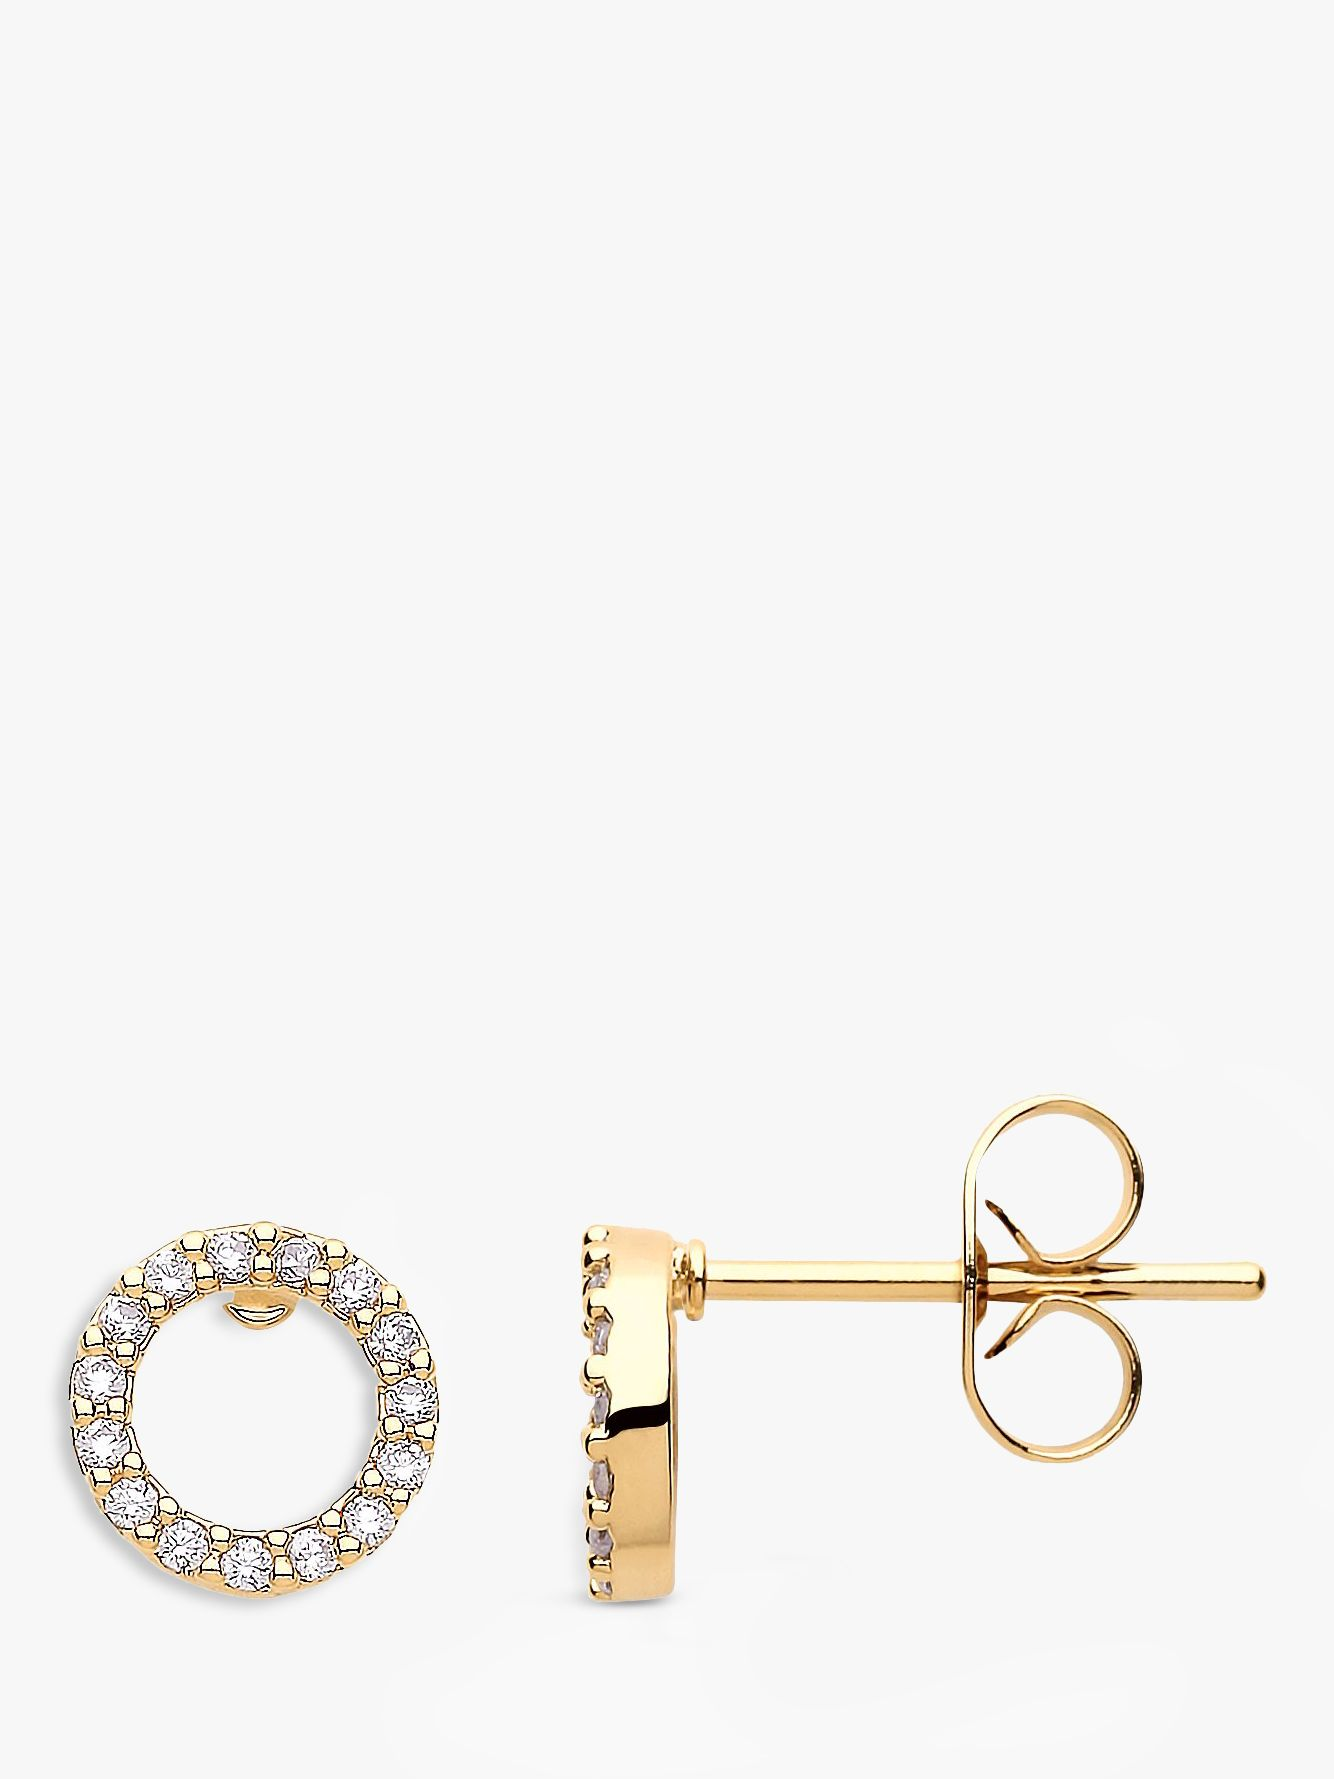 Estella Bartlett Estella Bartlett Cubic Zirconia Open Circle Stud Earrings, Gold